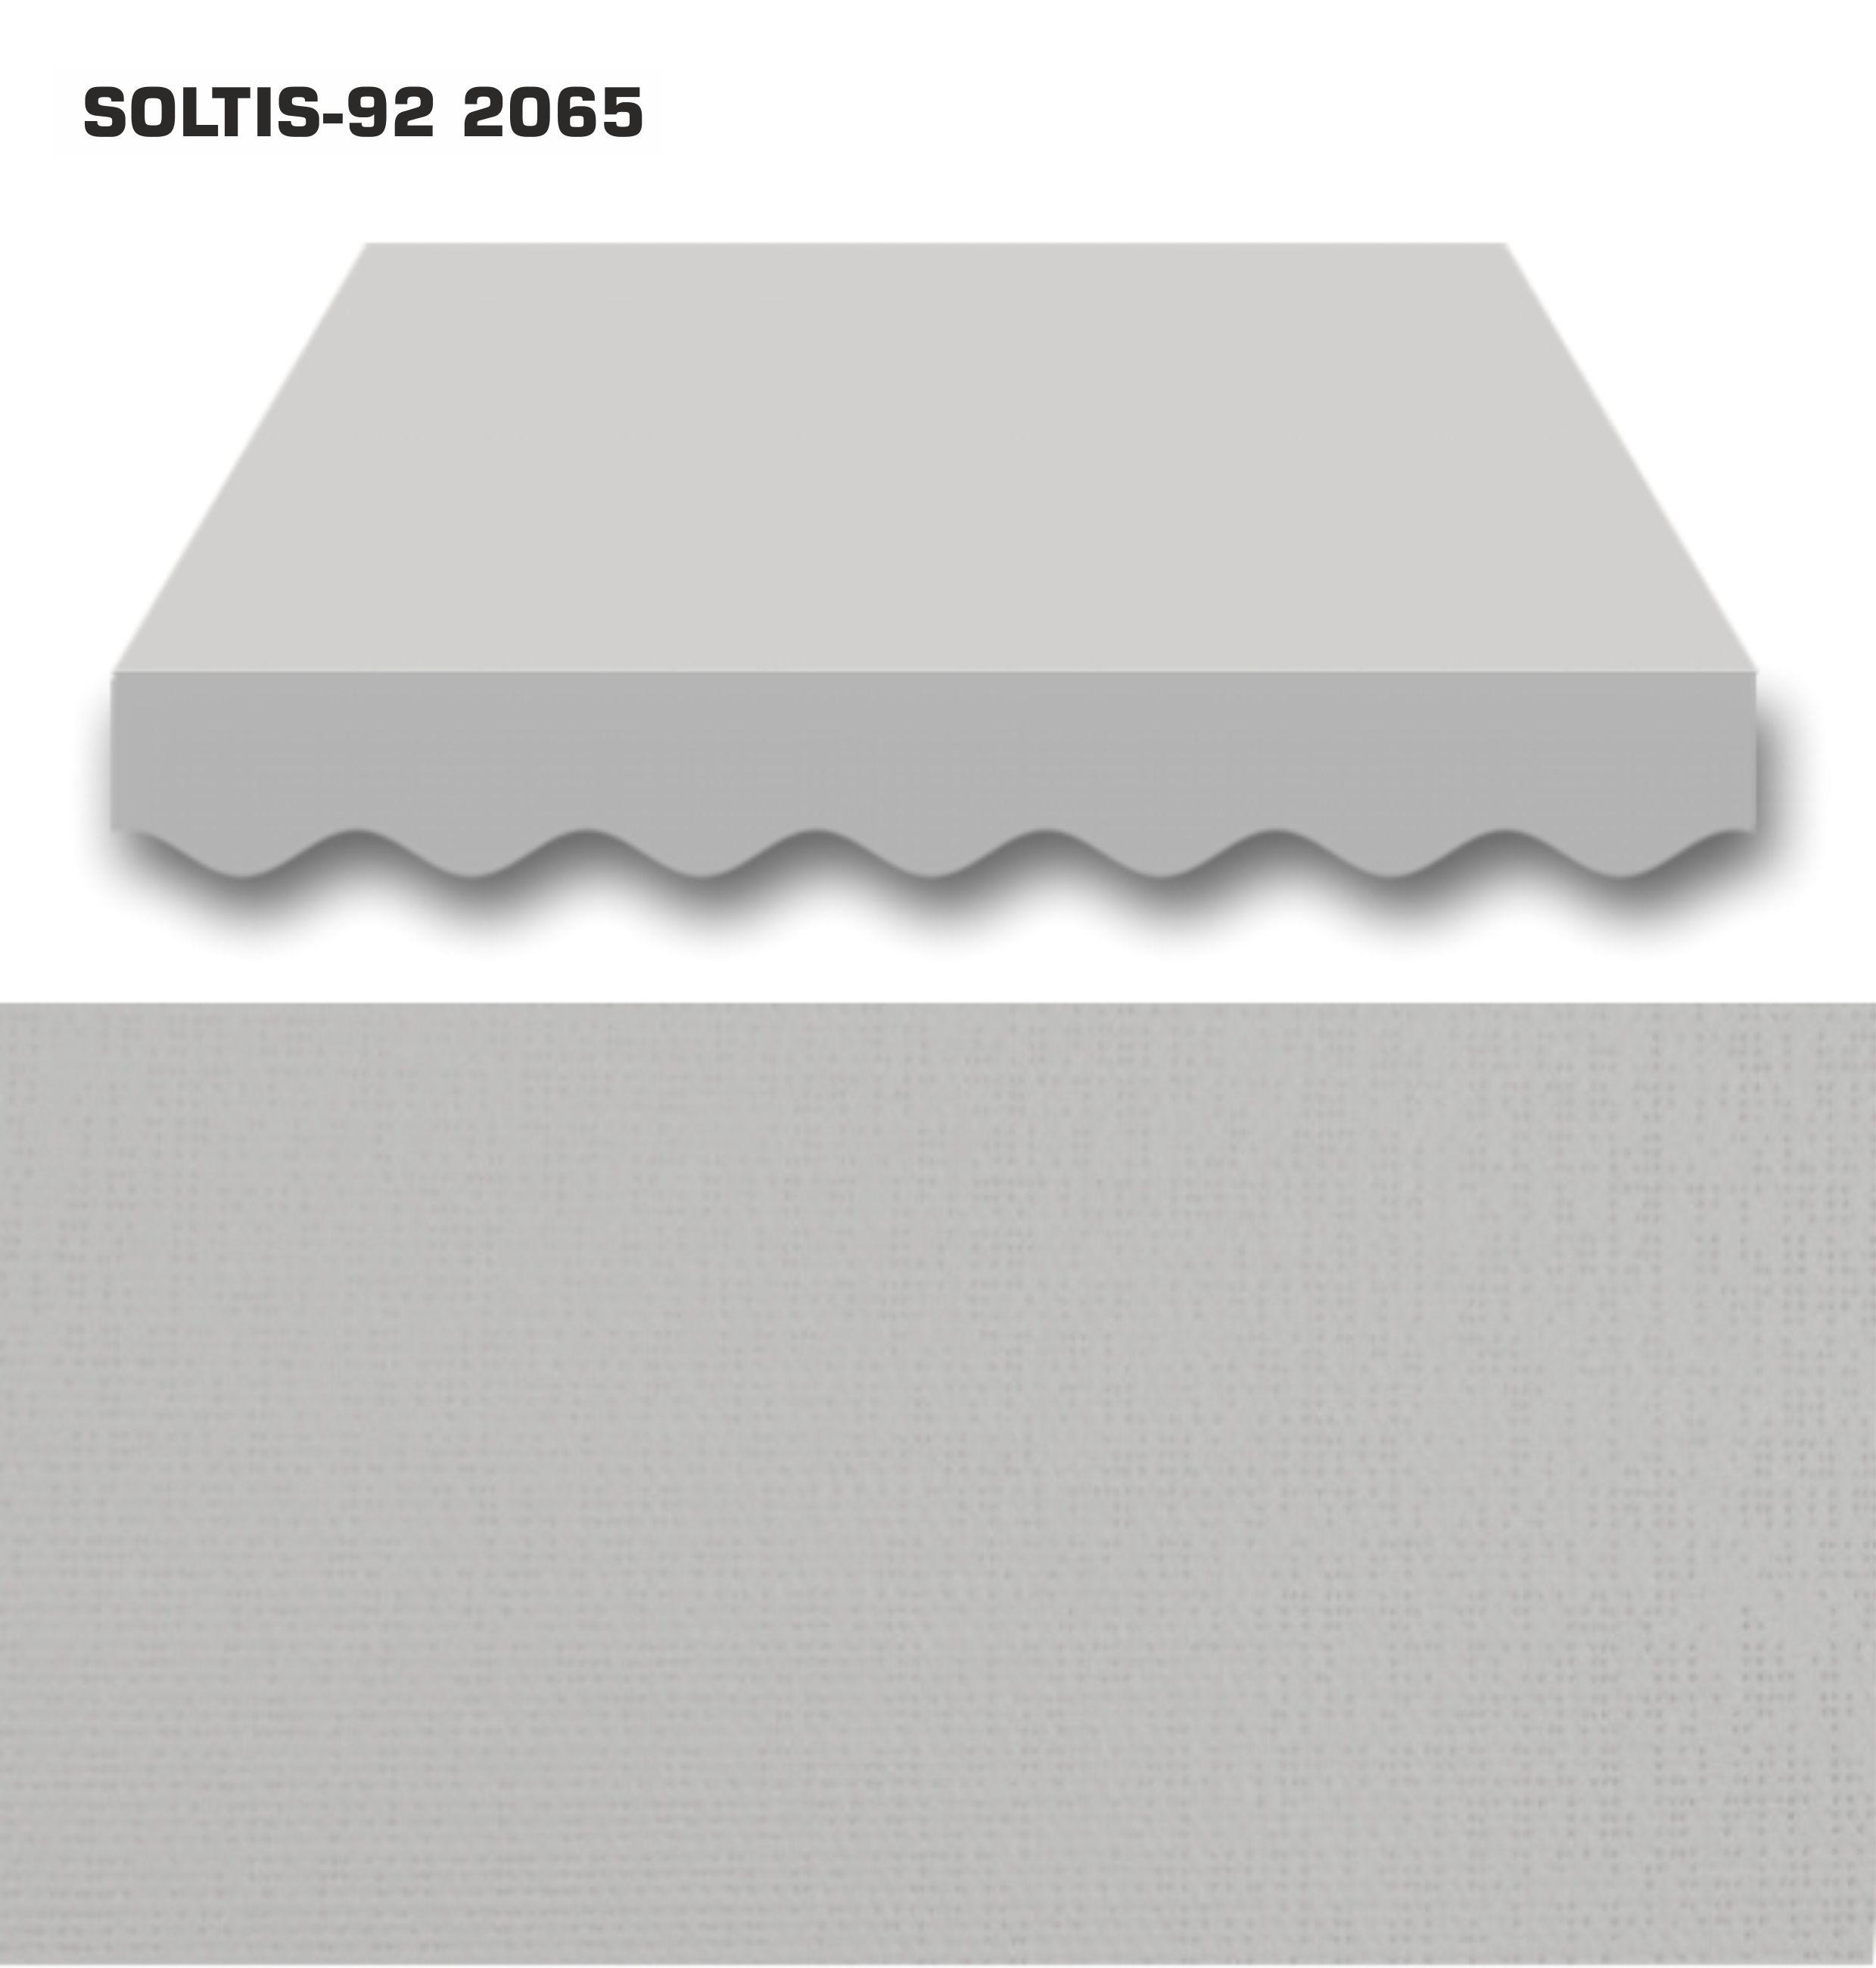 Soltis-92 2065